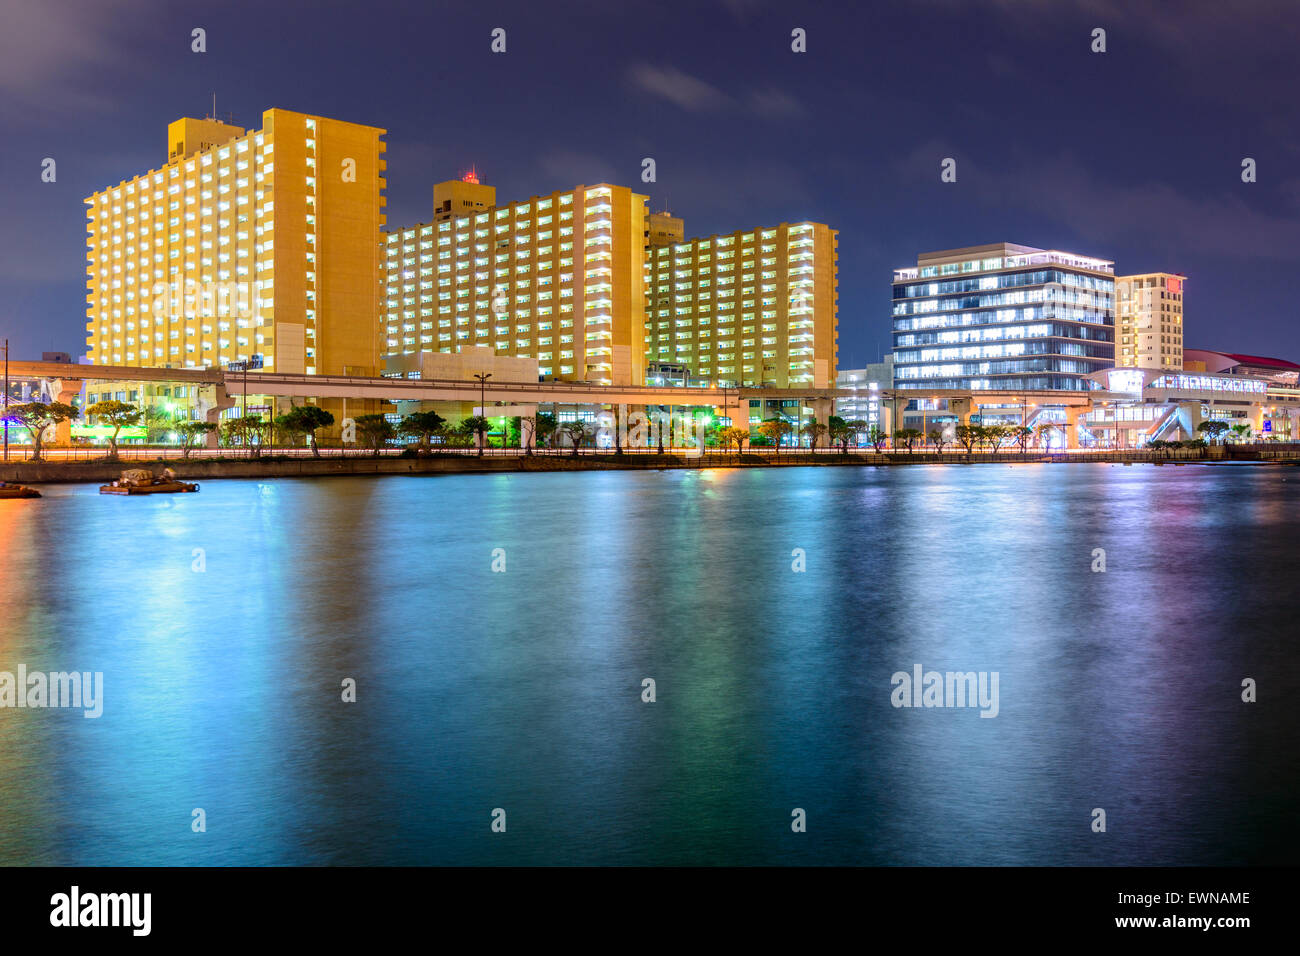 Naha, Okinawa, Japan night cityscape. - Stock Image